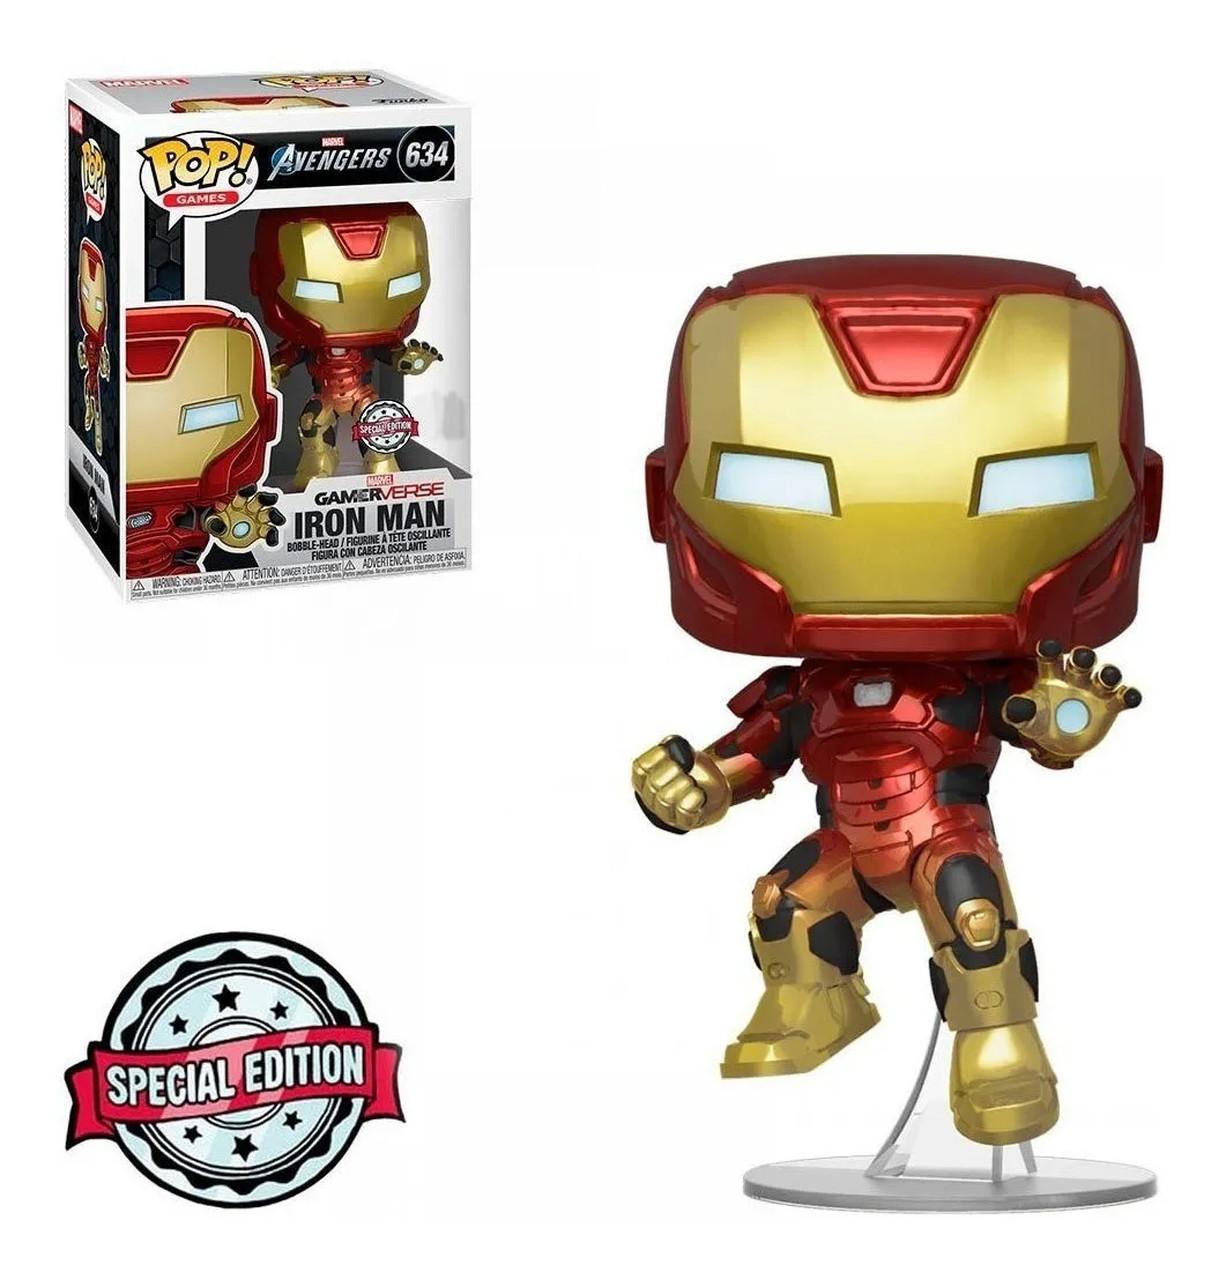 Funko Pop! Homem de Ferro (Iron Man): Vingadores (Avengers) Gamerverse (Marvel) #634 - Funko